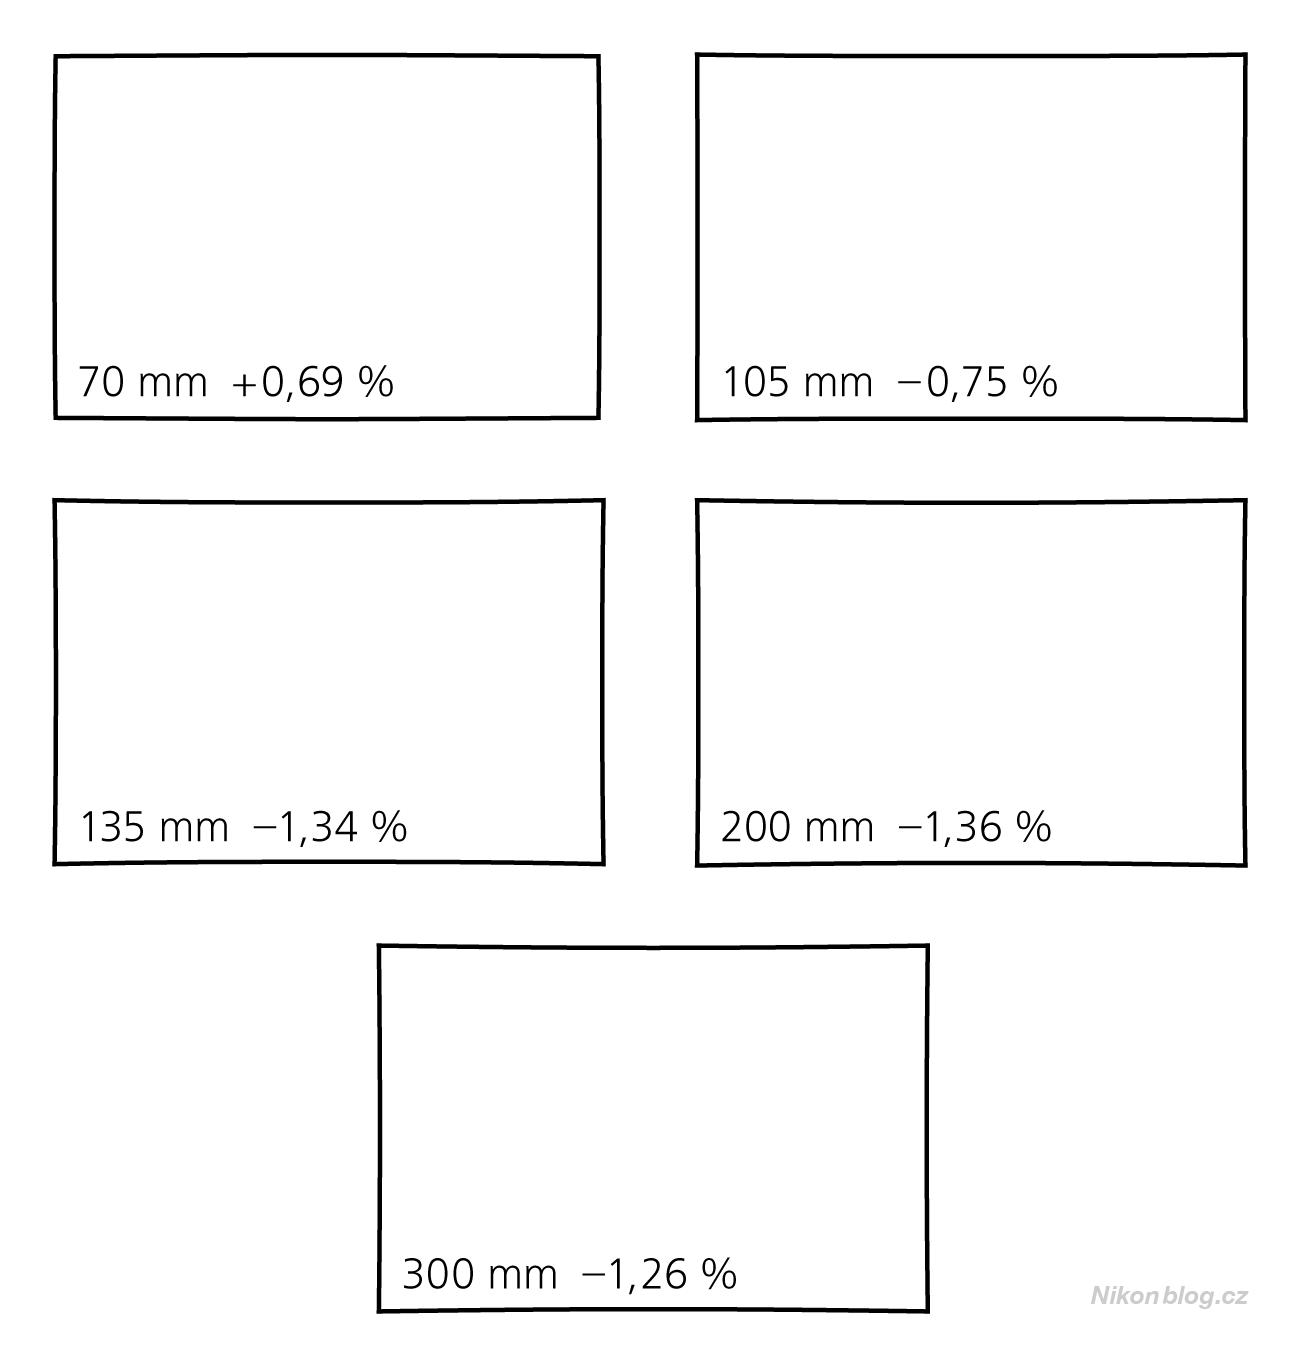 Geometrické zkreslení objektivu AF-P DX Nikkor 70–300 mm F4,5–6,3G ED VR